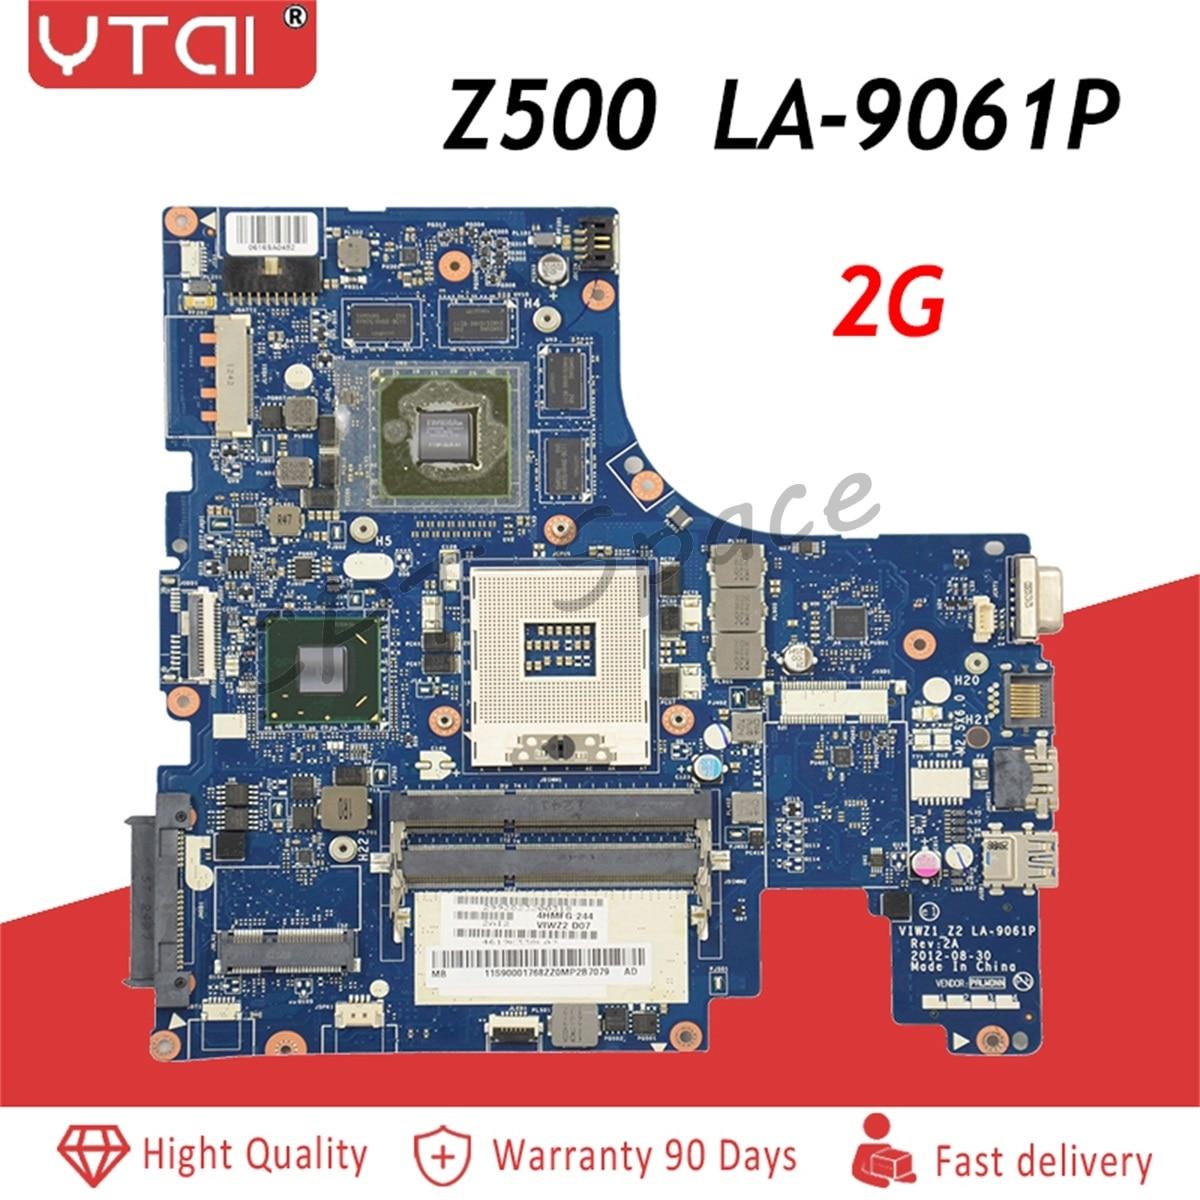 LA-9063P Z500 placa base para Lenovo Z500 placa base de computadora portátil VIWZI-Z2 LA-9063P 2G HM77 100% prueba intacto